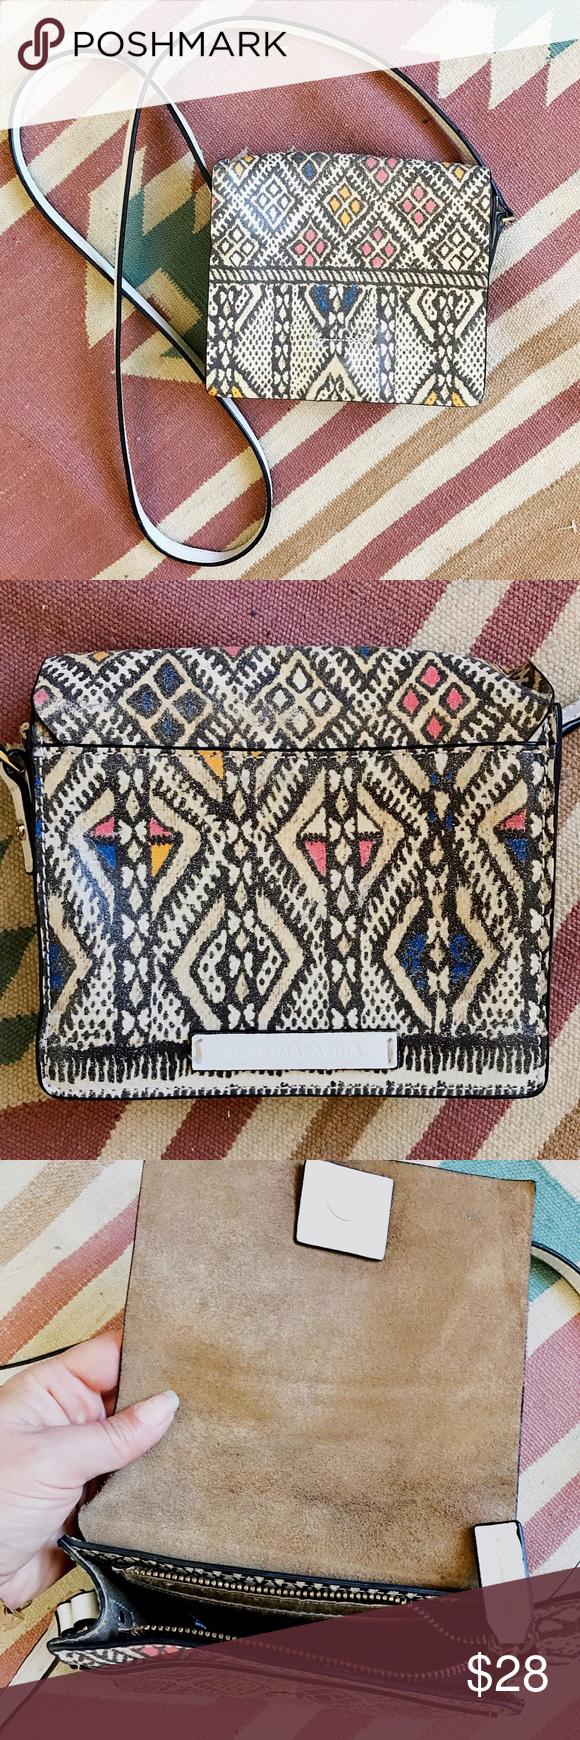 BCBG MAXAZRIA small cross-body Oh my gosh how I love this pattern, super cool BCBG leather bag w/long strap & zipper closure. BCBGMaxAzria Bags Crossbody Bags